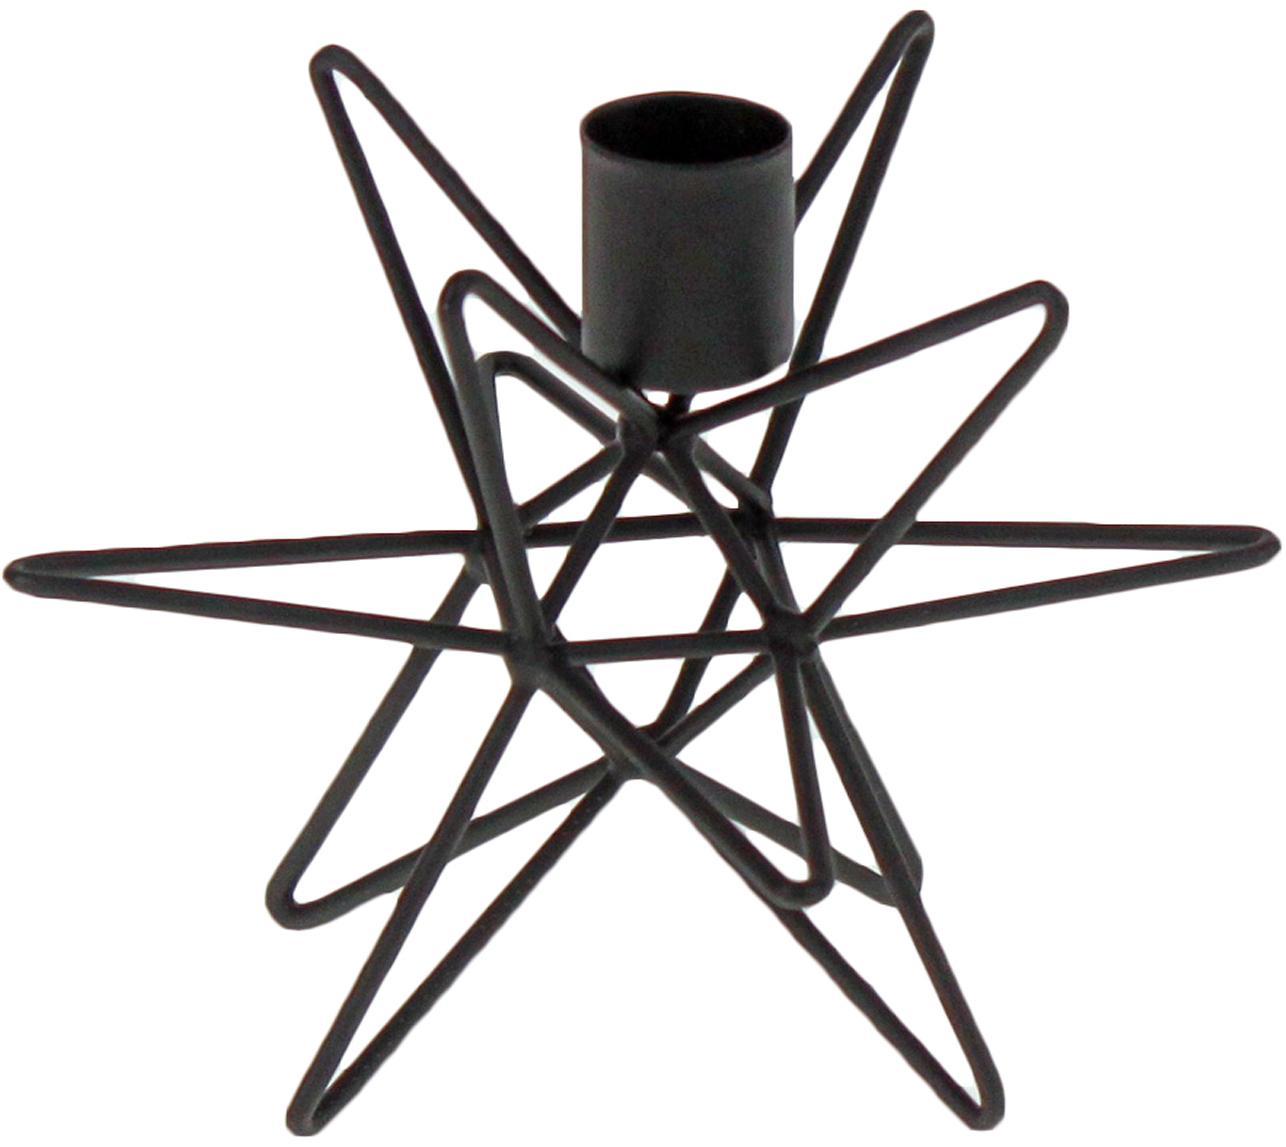 Kandelaar Cosma, Gelakt metaal, Zwart, Ø 15 x H 11 cm